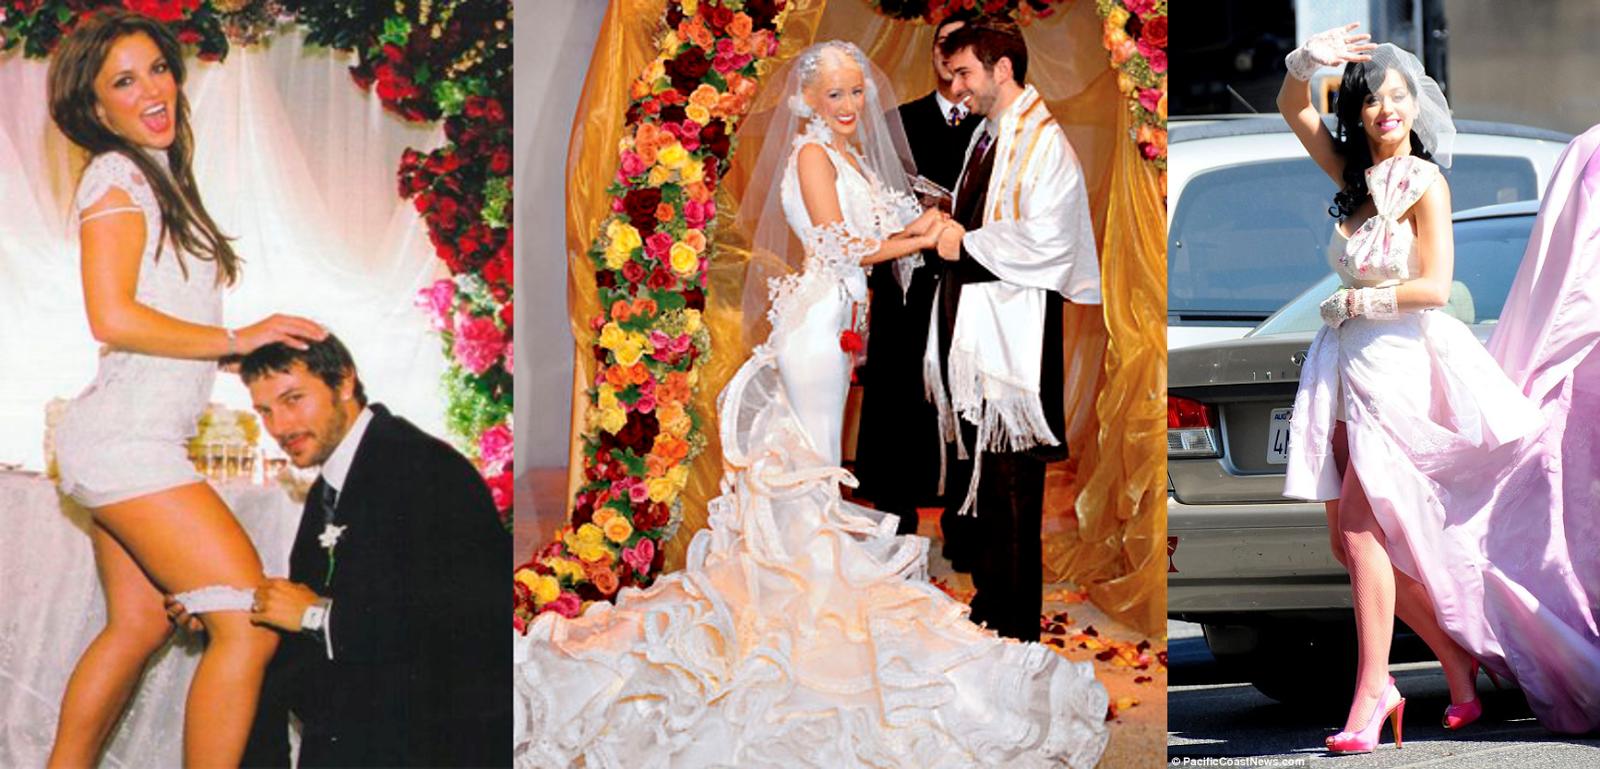 Boda de Britney Spears, boda de Christina Aguilera y boda de Kate Perry